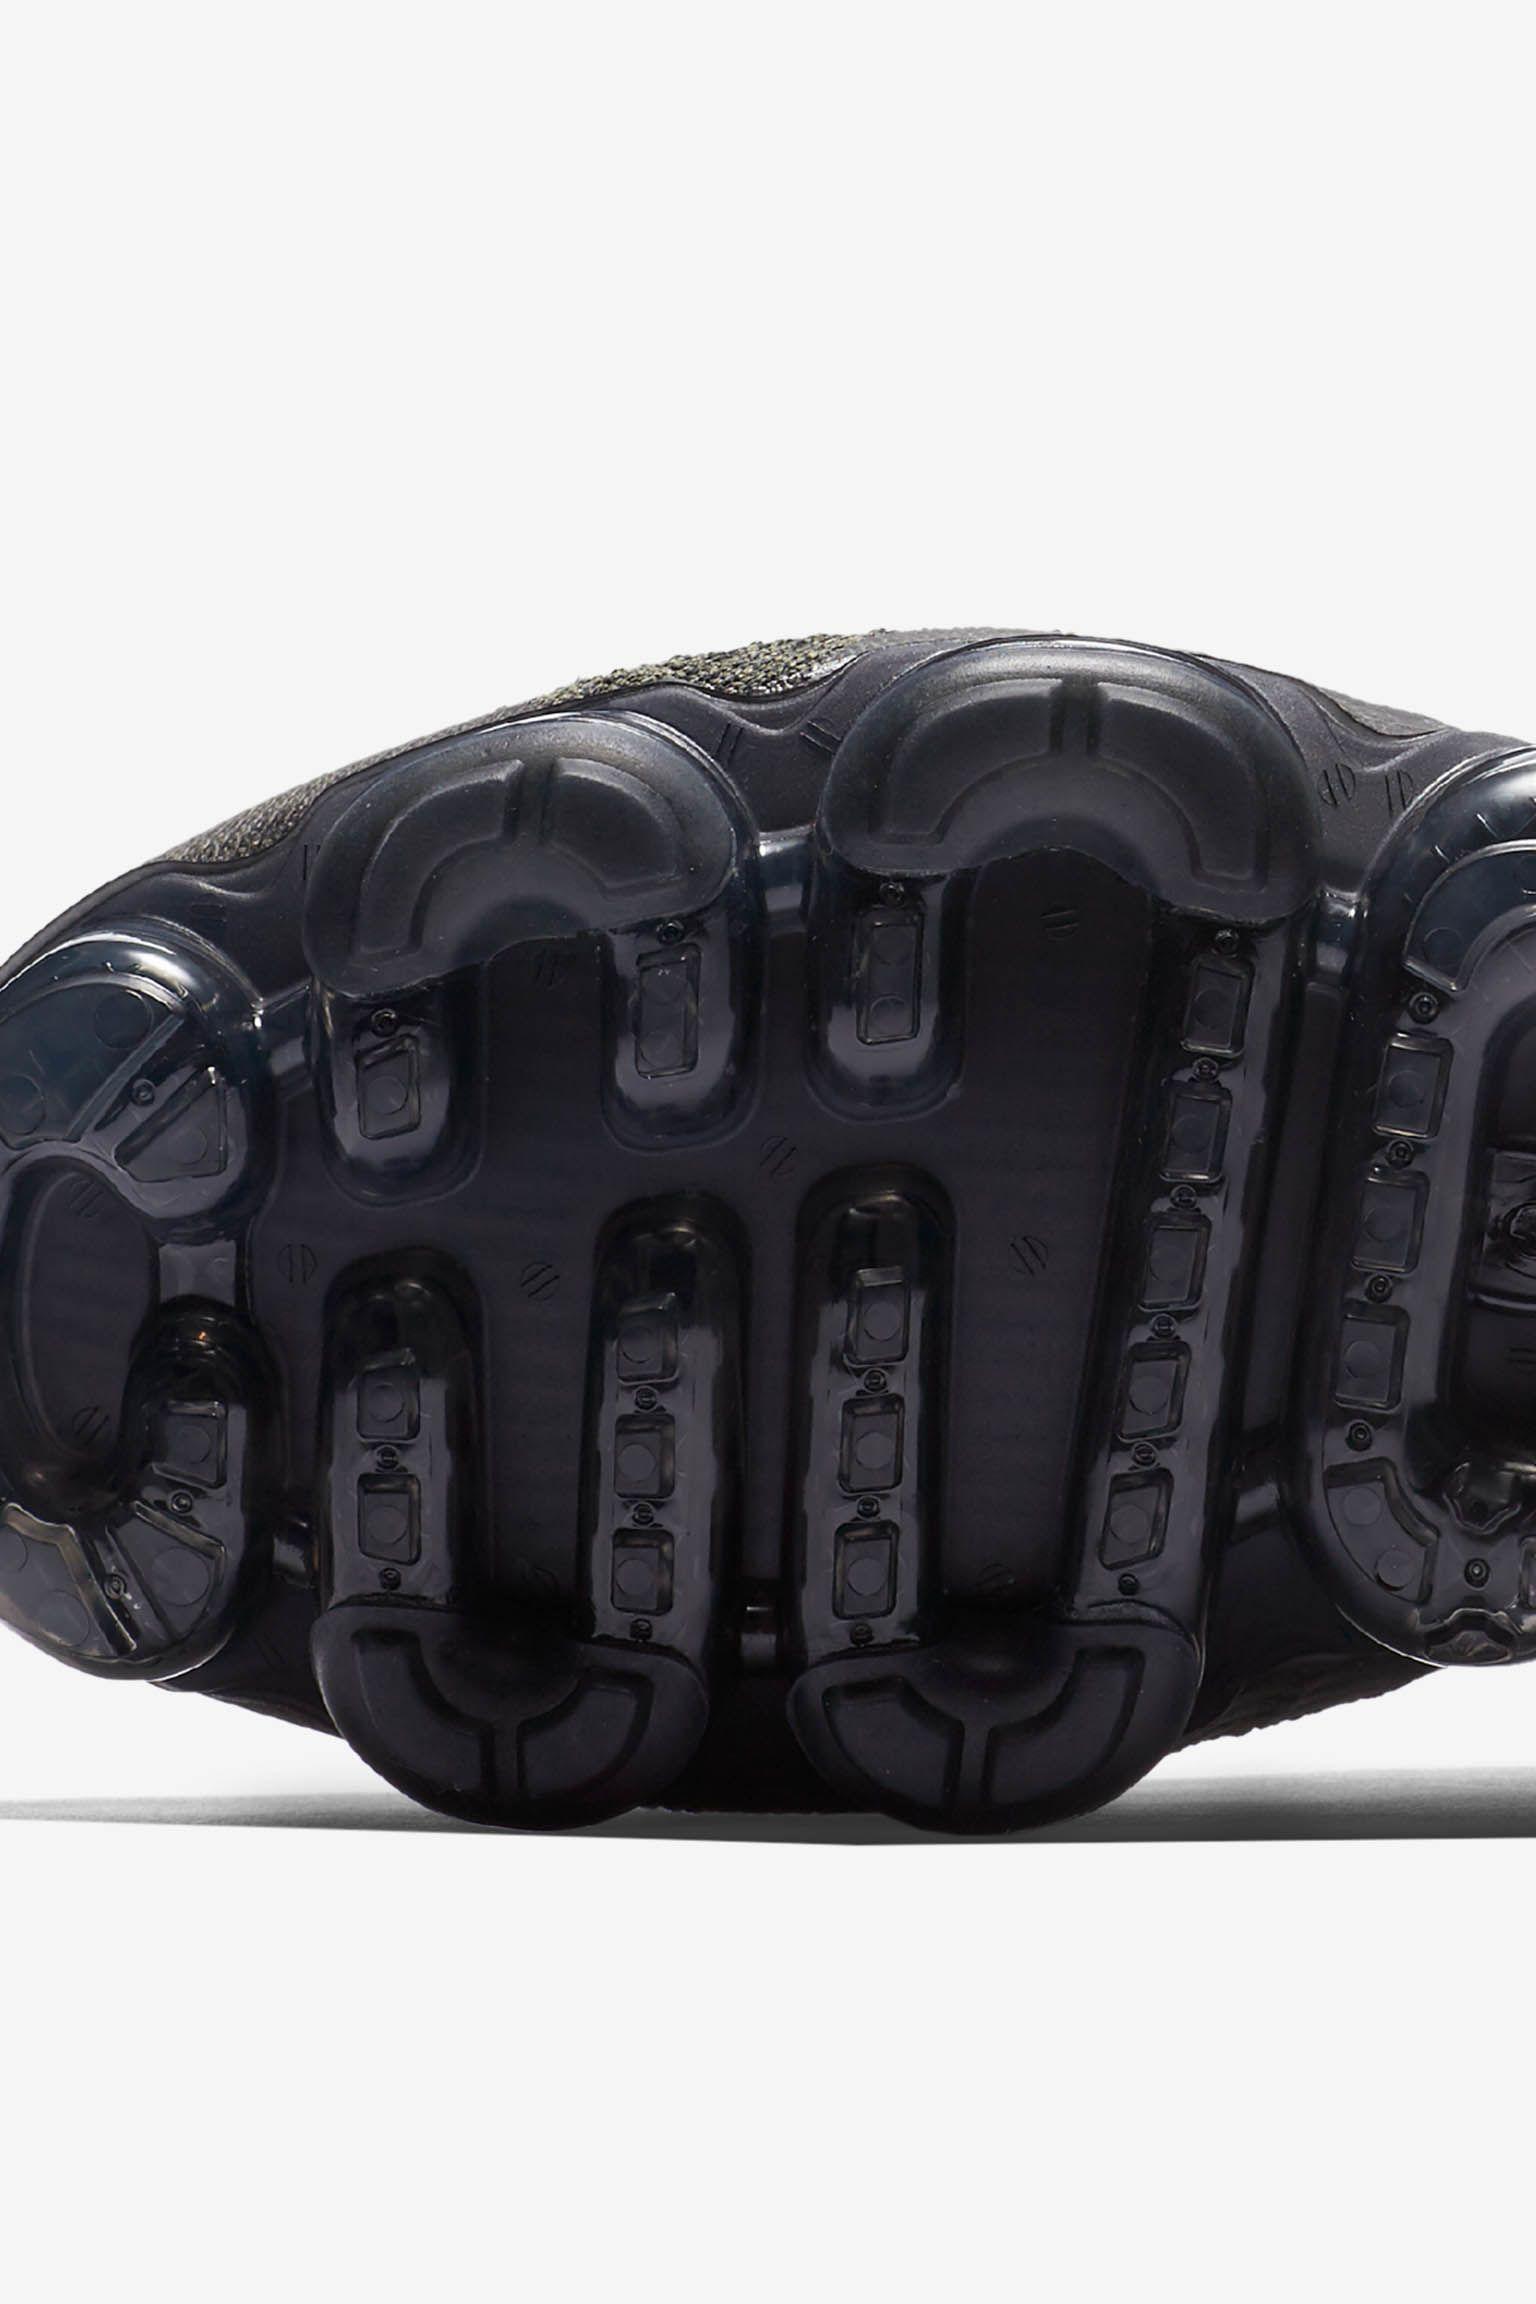 Nike Air Vapormax 'Cargo Khaki & Black' Release Date